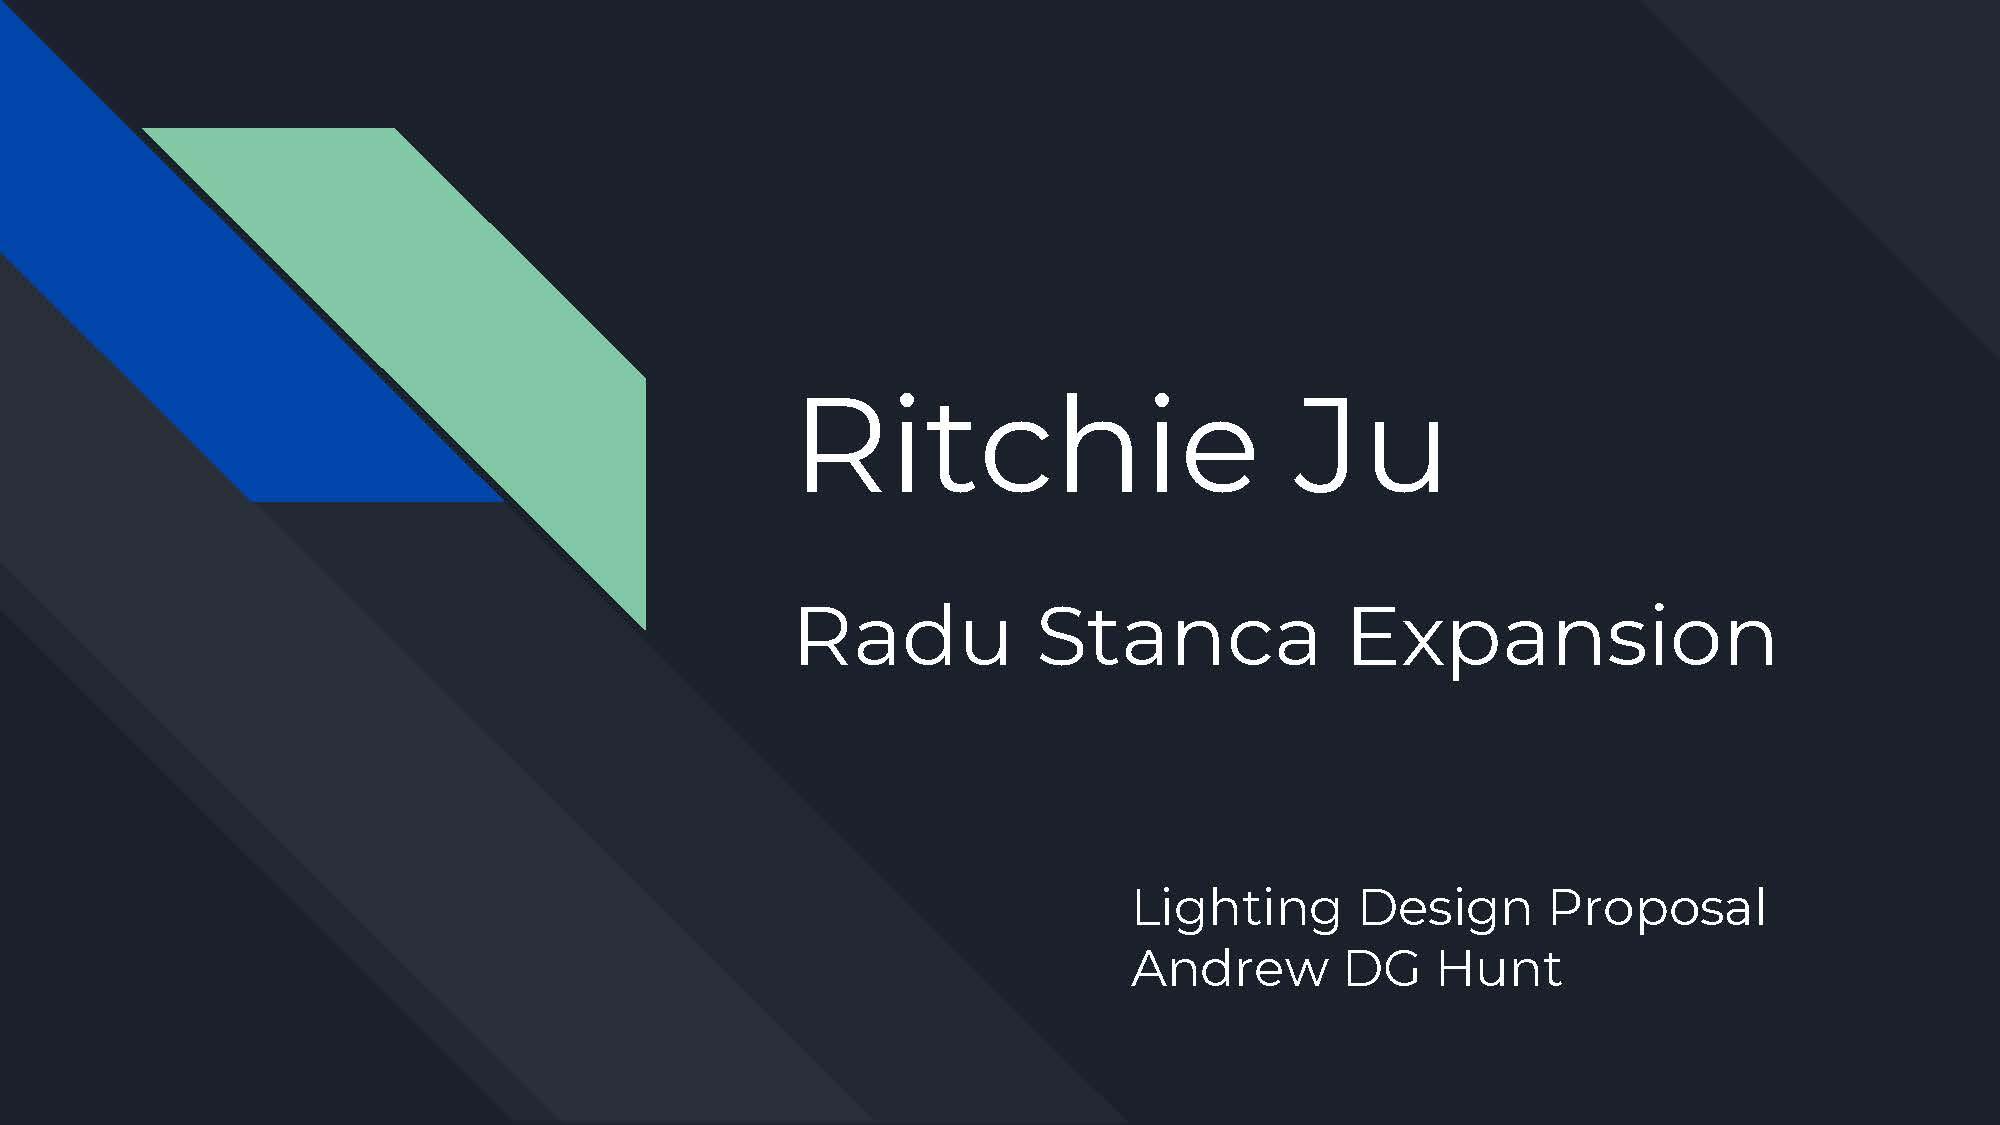 Ritchie Ju Presentation_Page_01.jpg